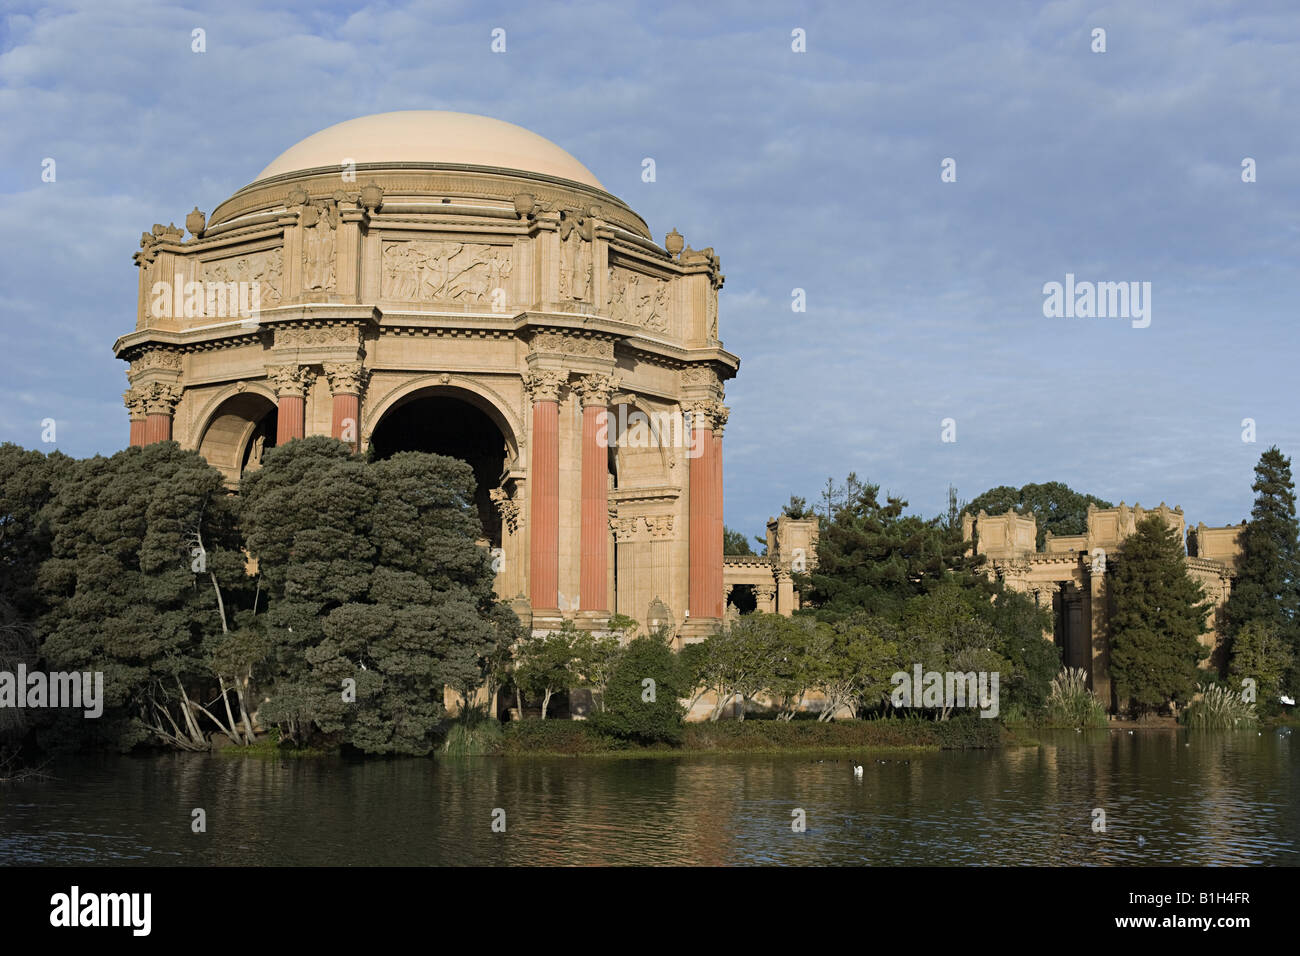 Palace of fine arts san francisco - Stock Image